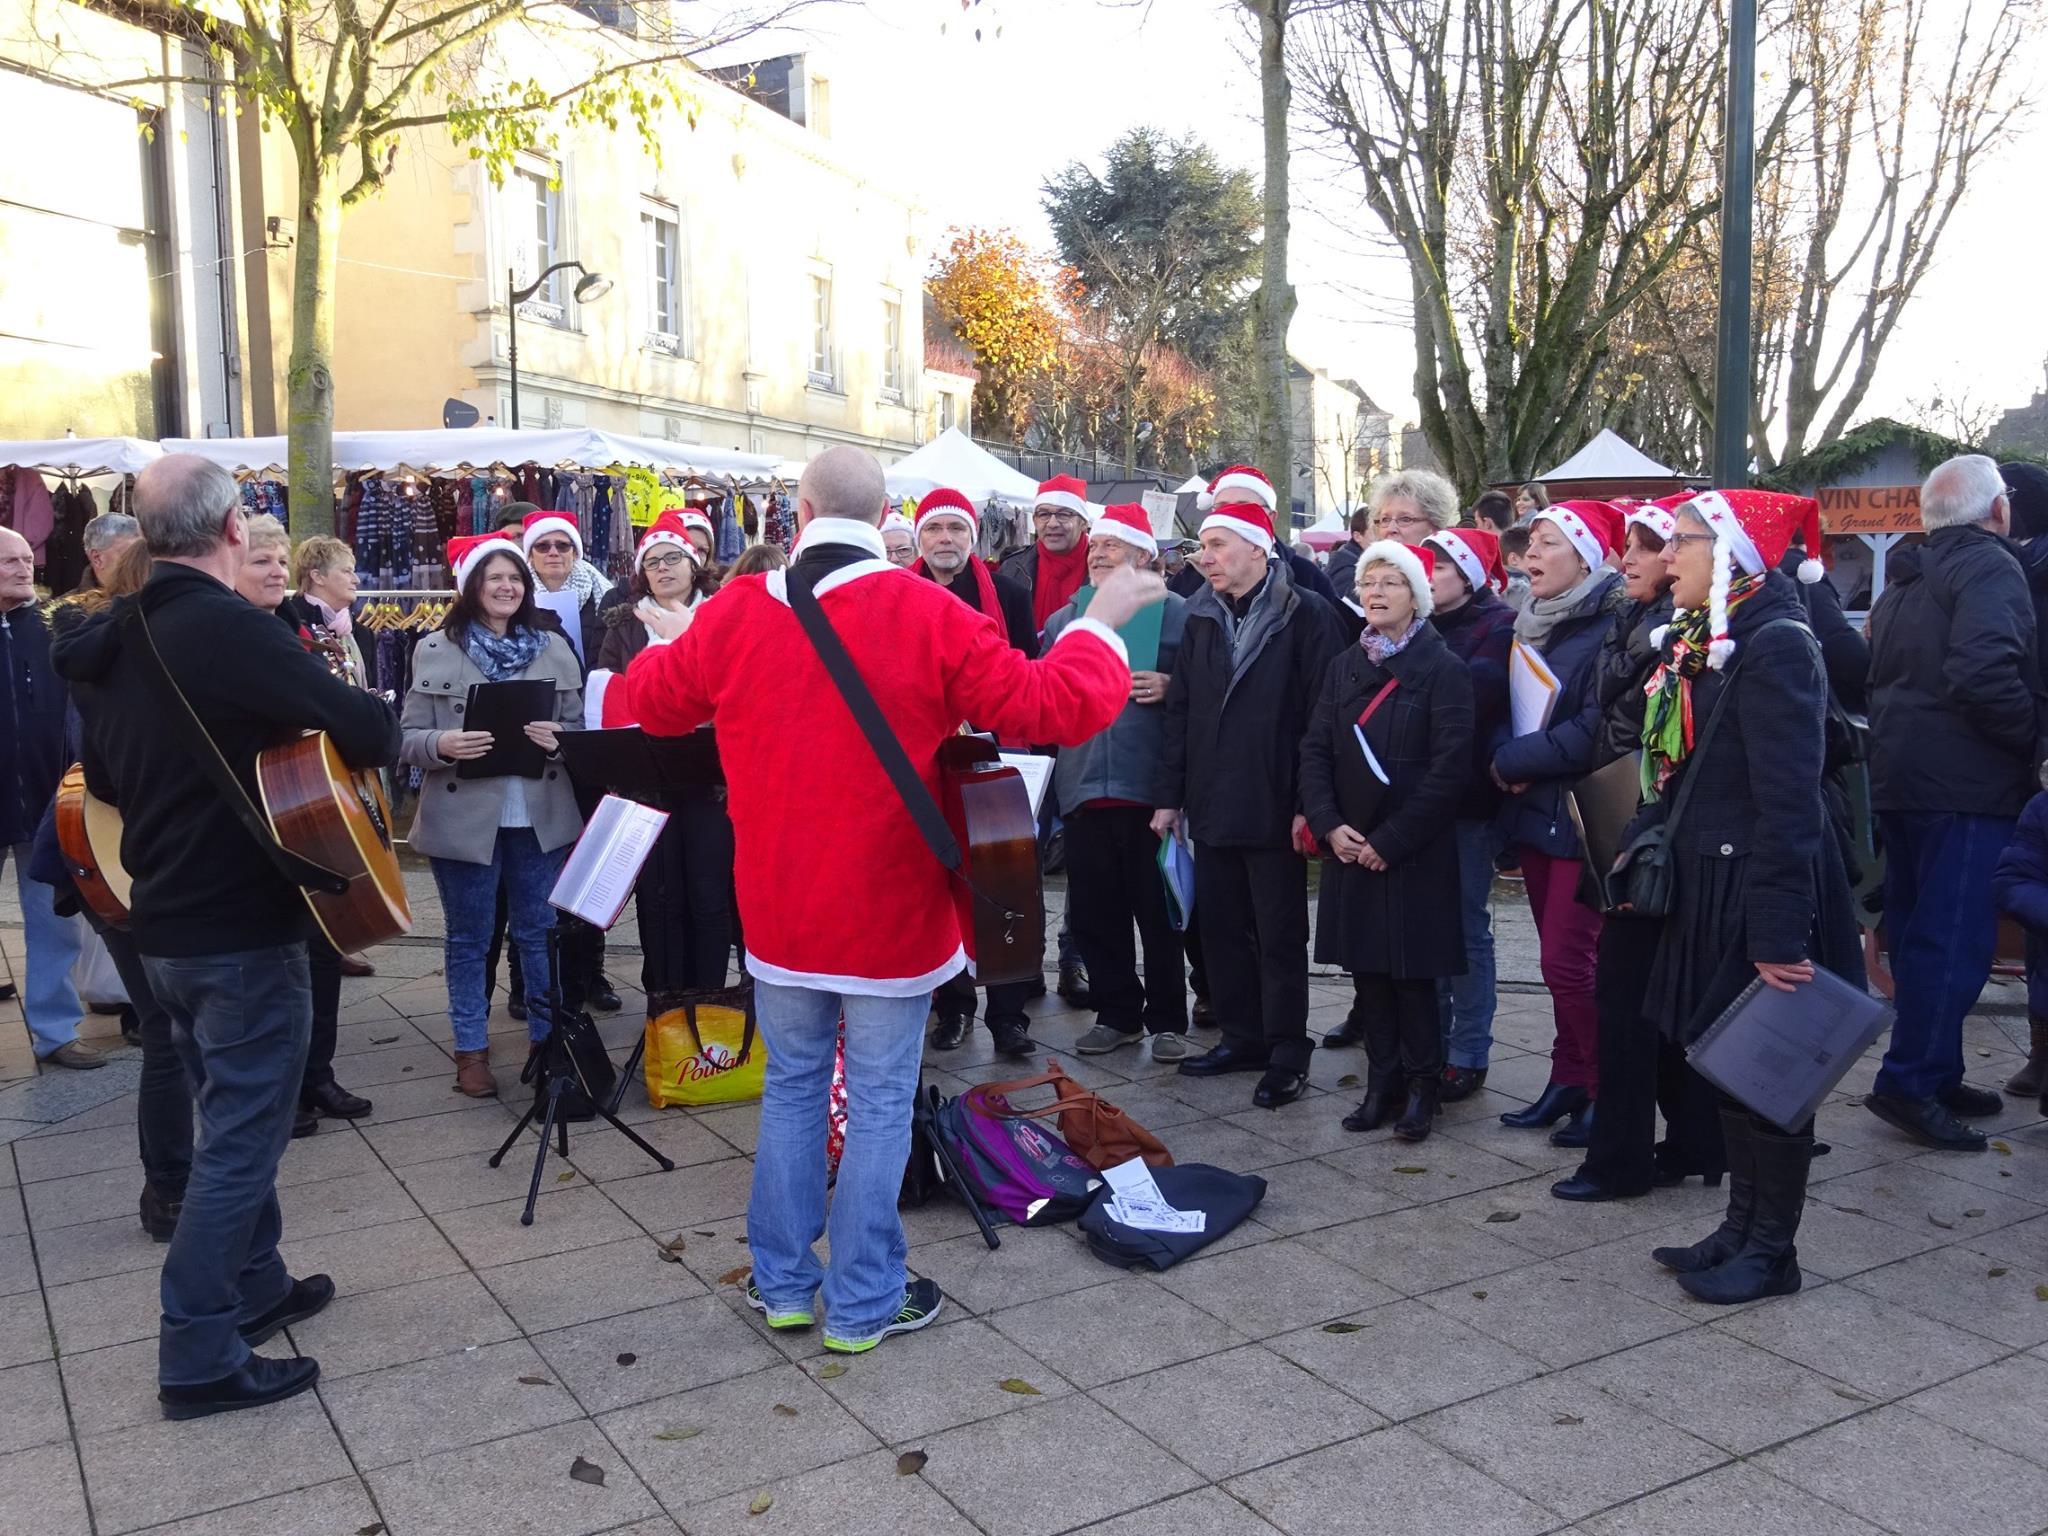 2015-12-12 – Au marché de Noël (1) Sabrina